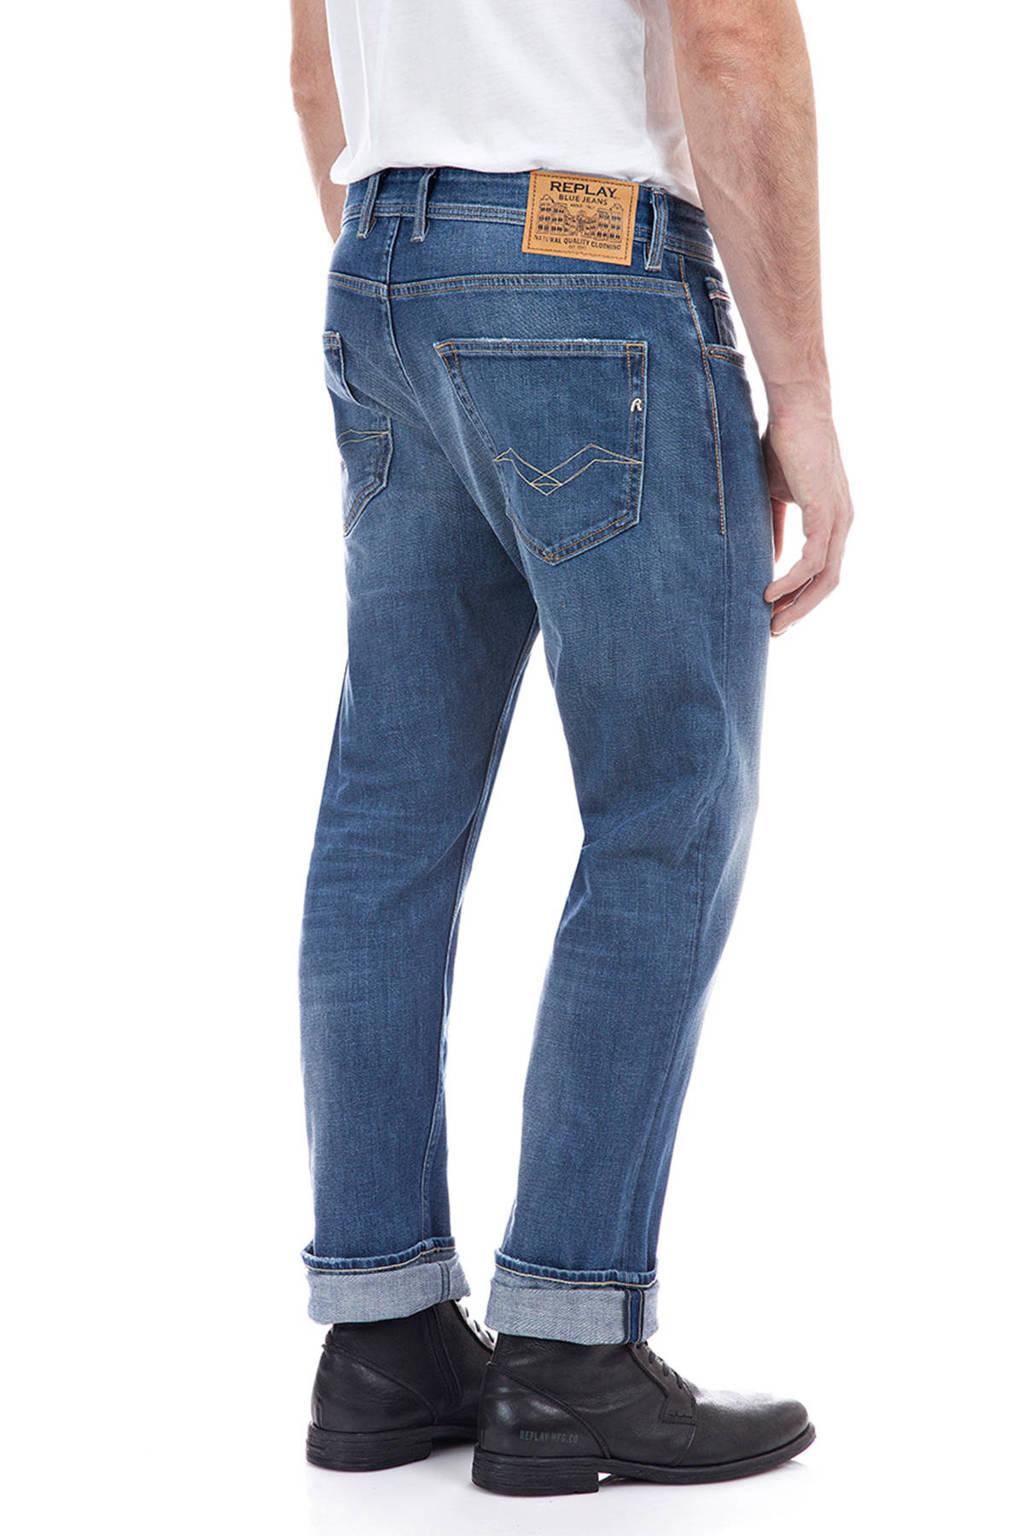 REPLAY straight fit jeans Grover medium blue, Medium blue